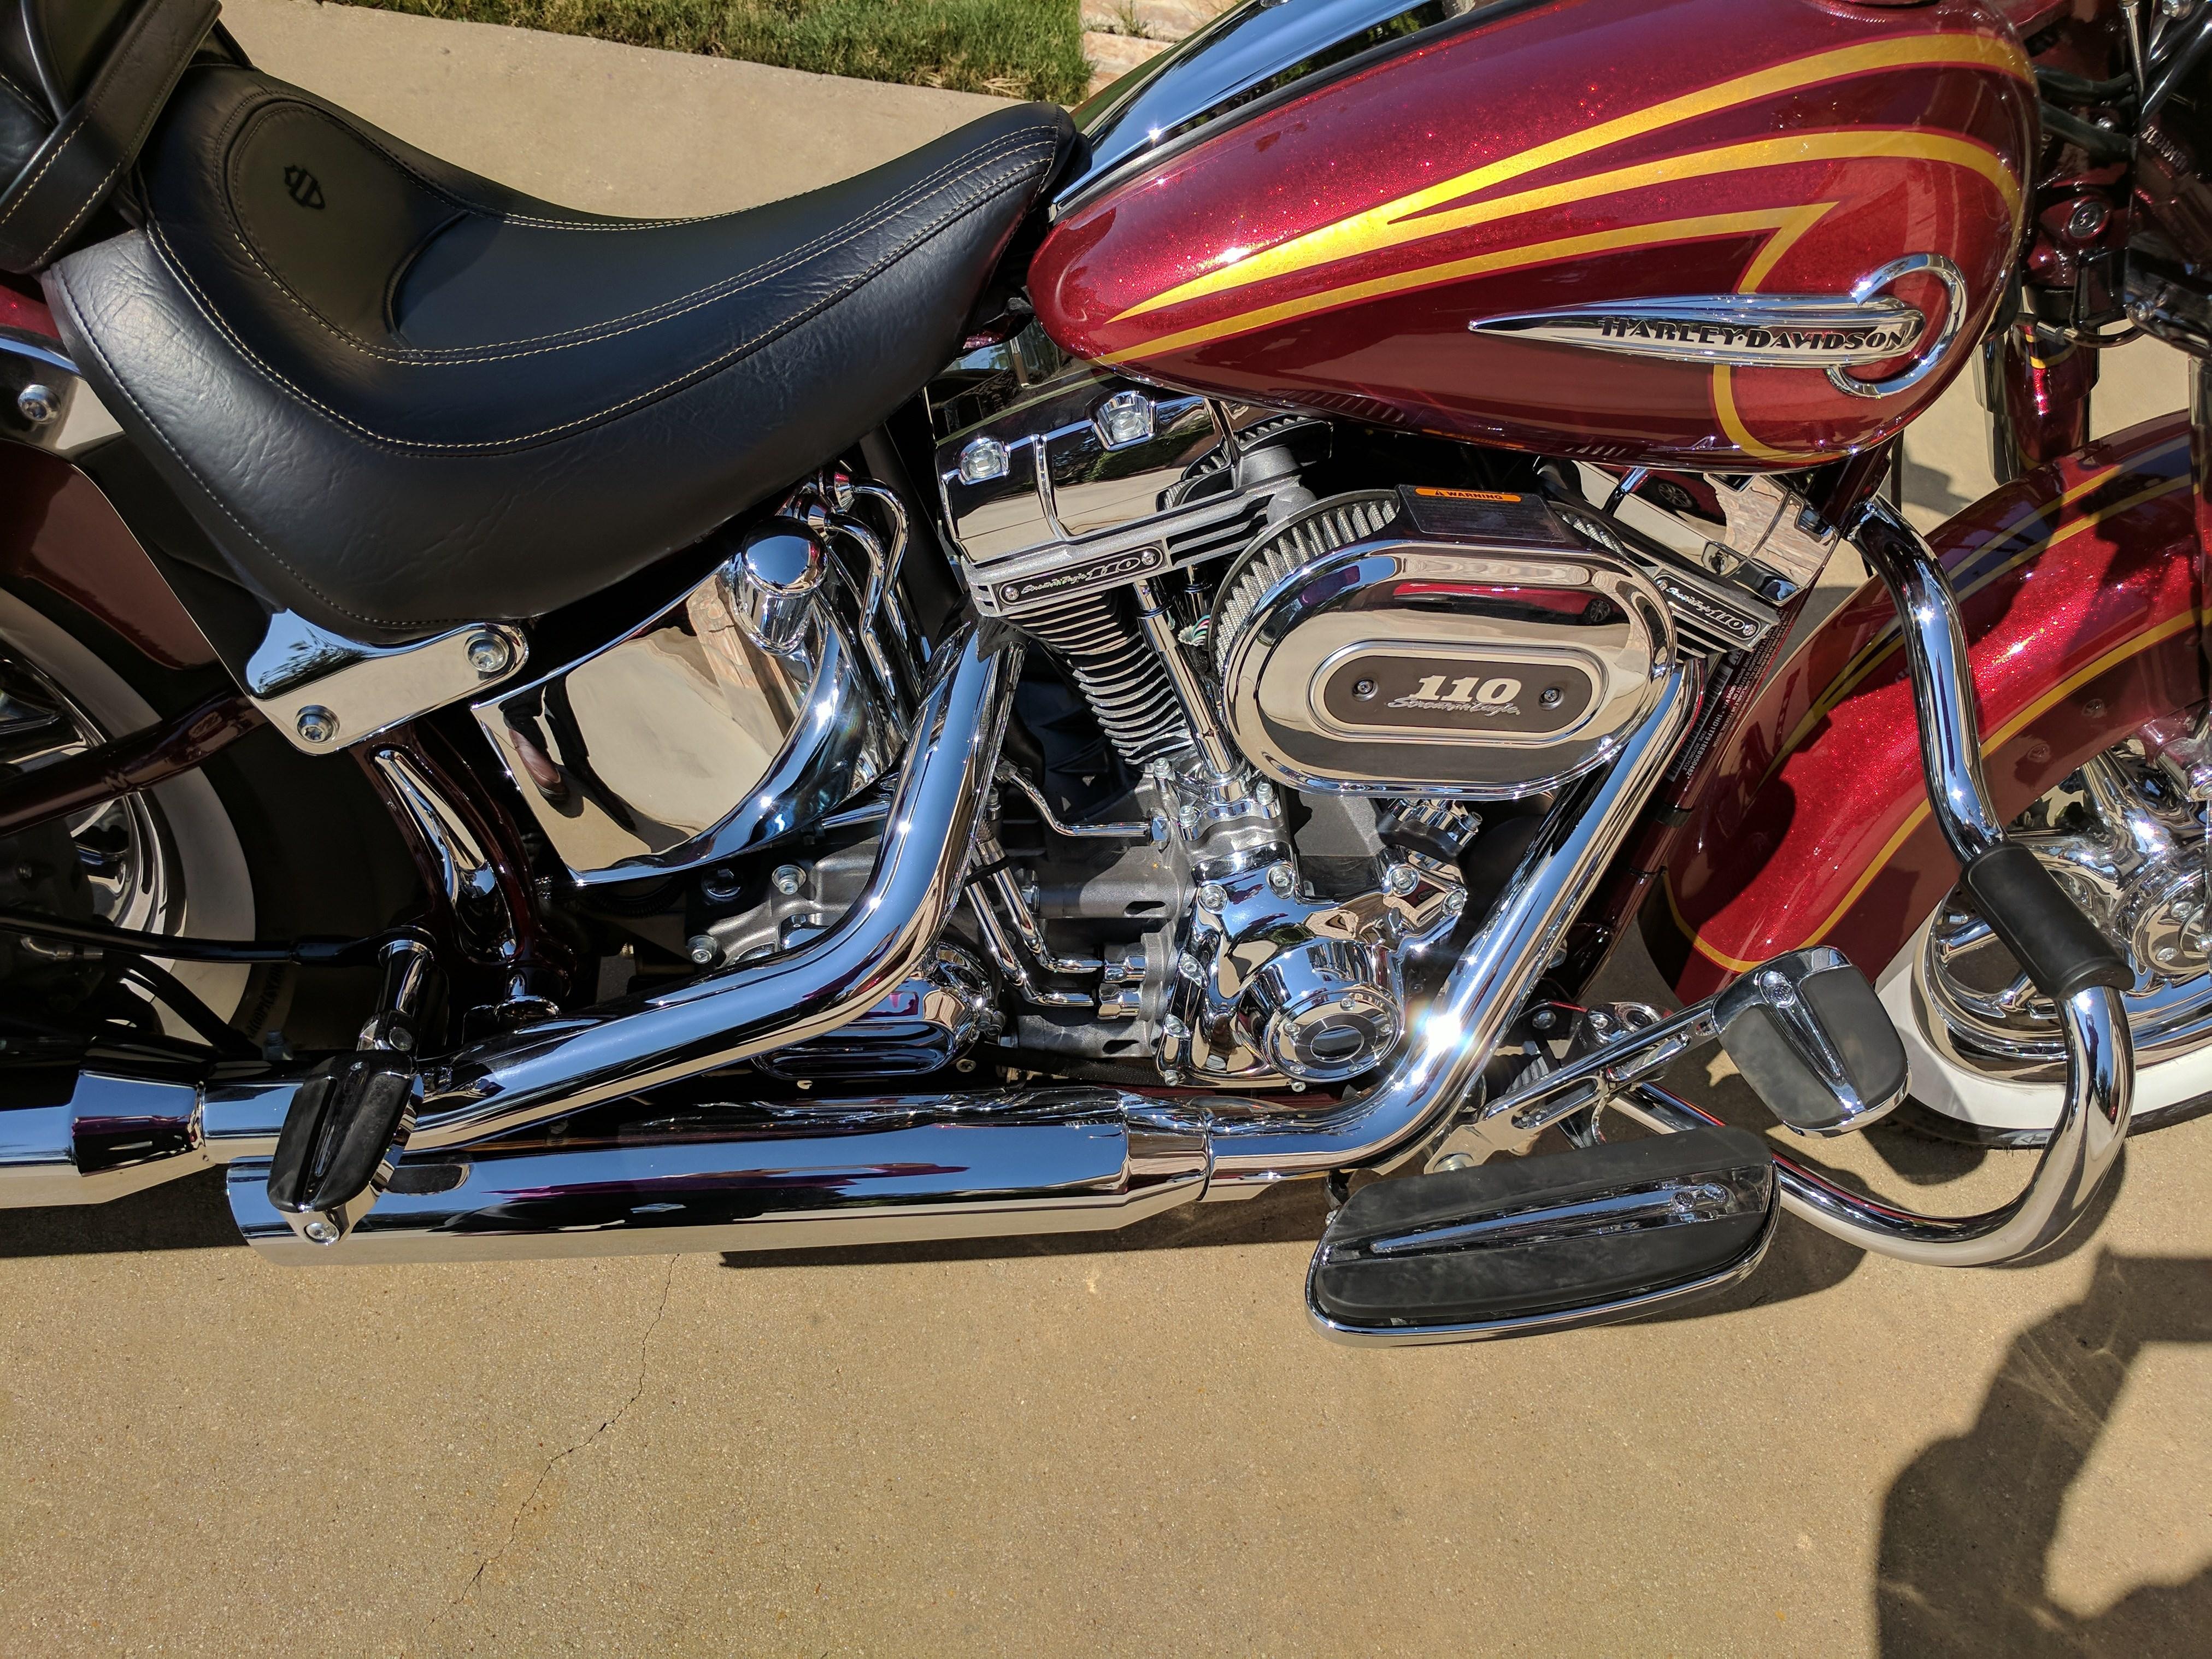 2017 Cvo For Sale Ga >> 2014 Harley-Davidson® FLSTNSE CVO™ Softail® Deluxe (Red), San Antonio, Texas (725353)   CycleCrunch